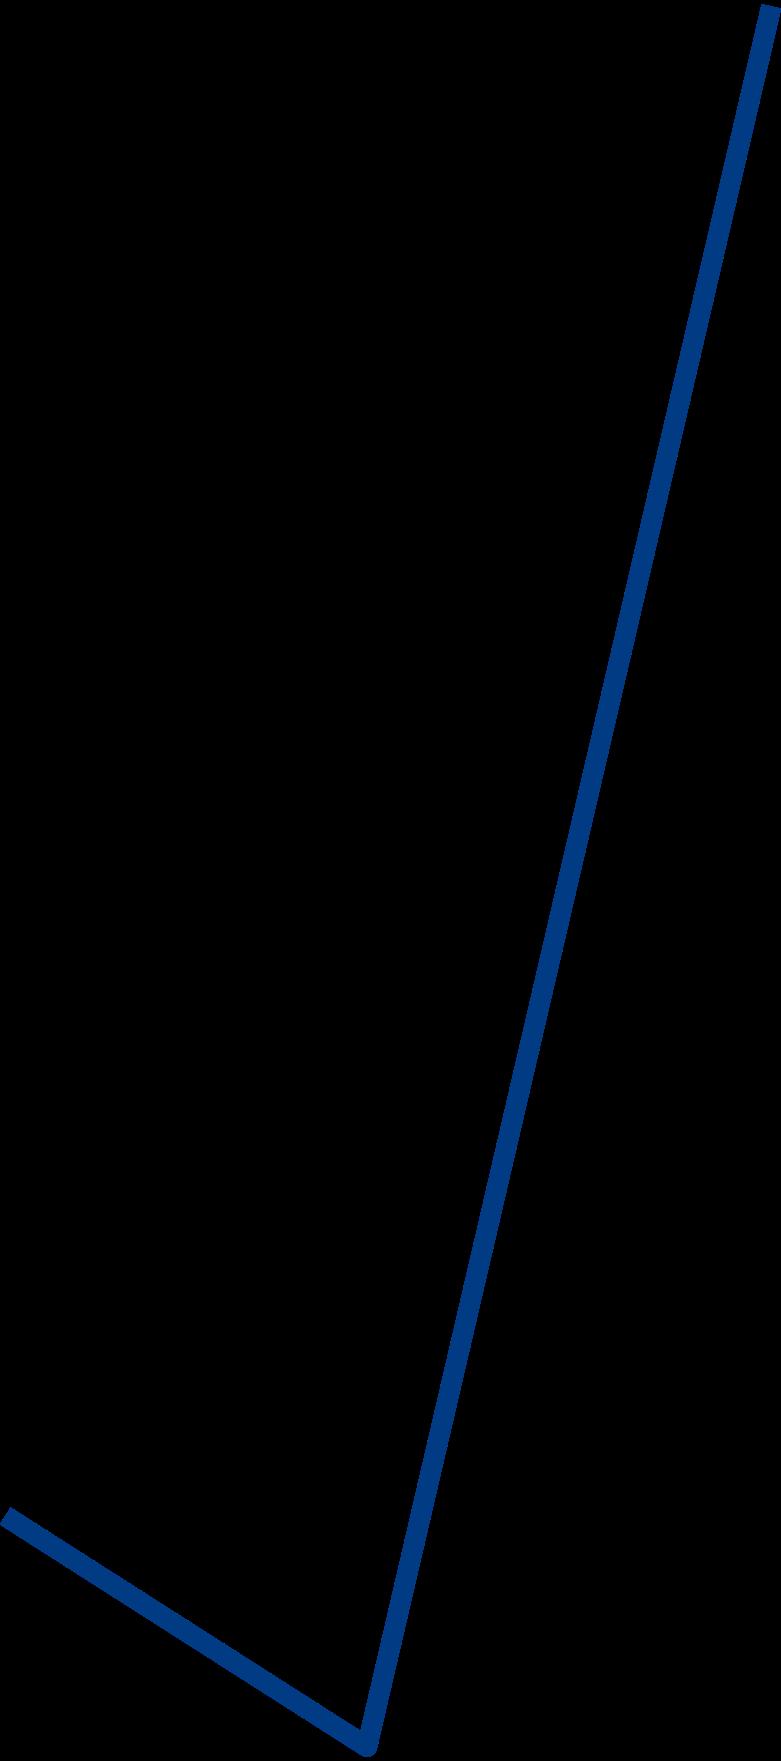 delta plane rail Clipart illustration in PNG, SVG